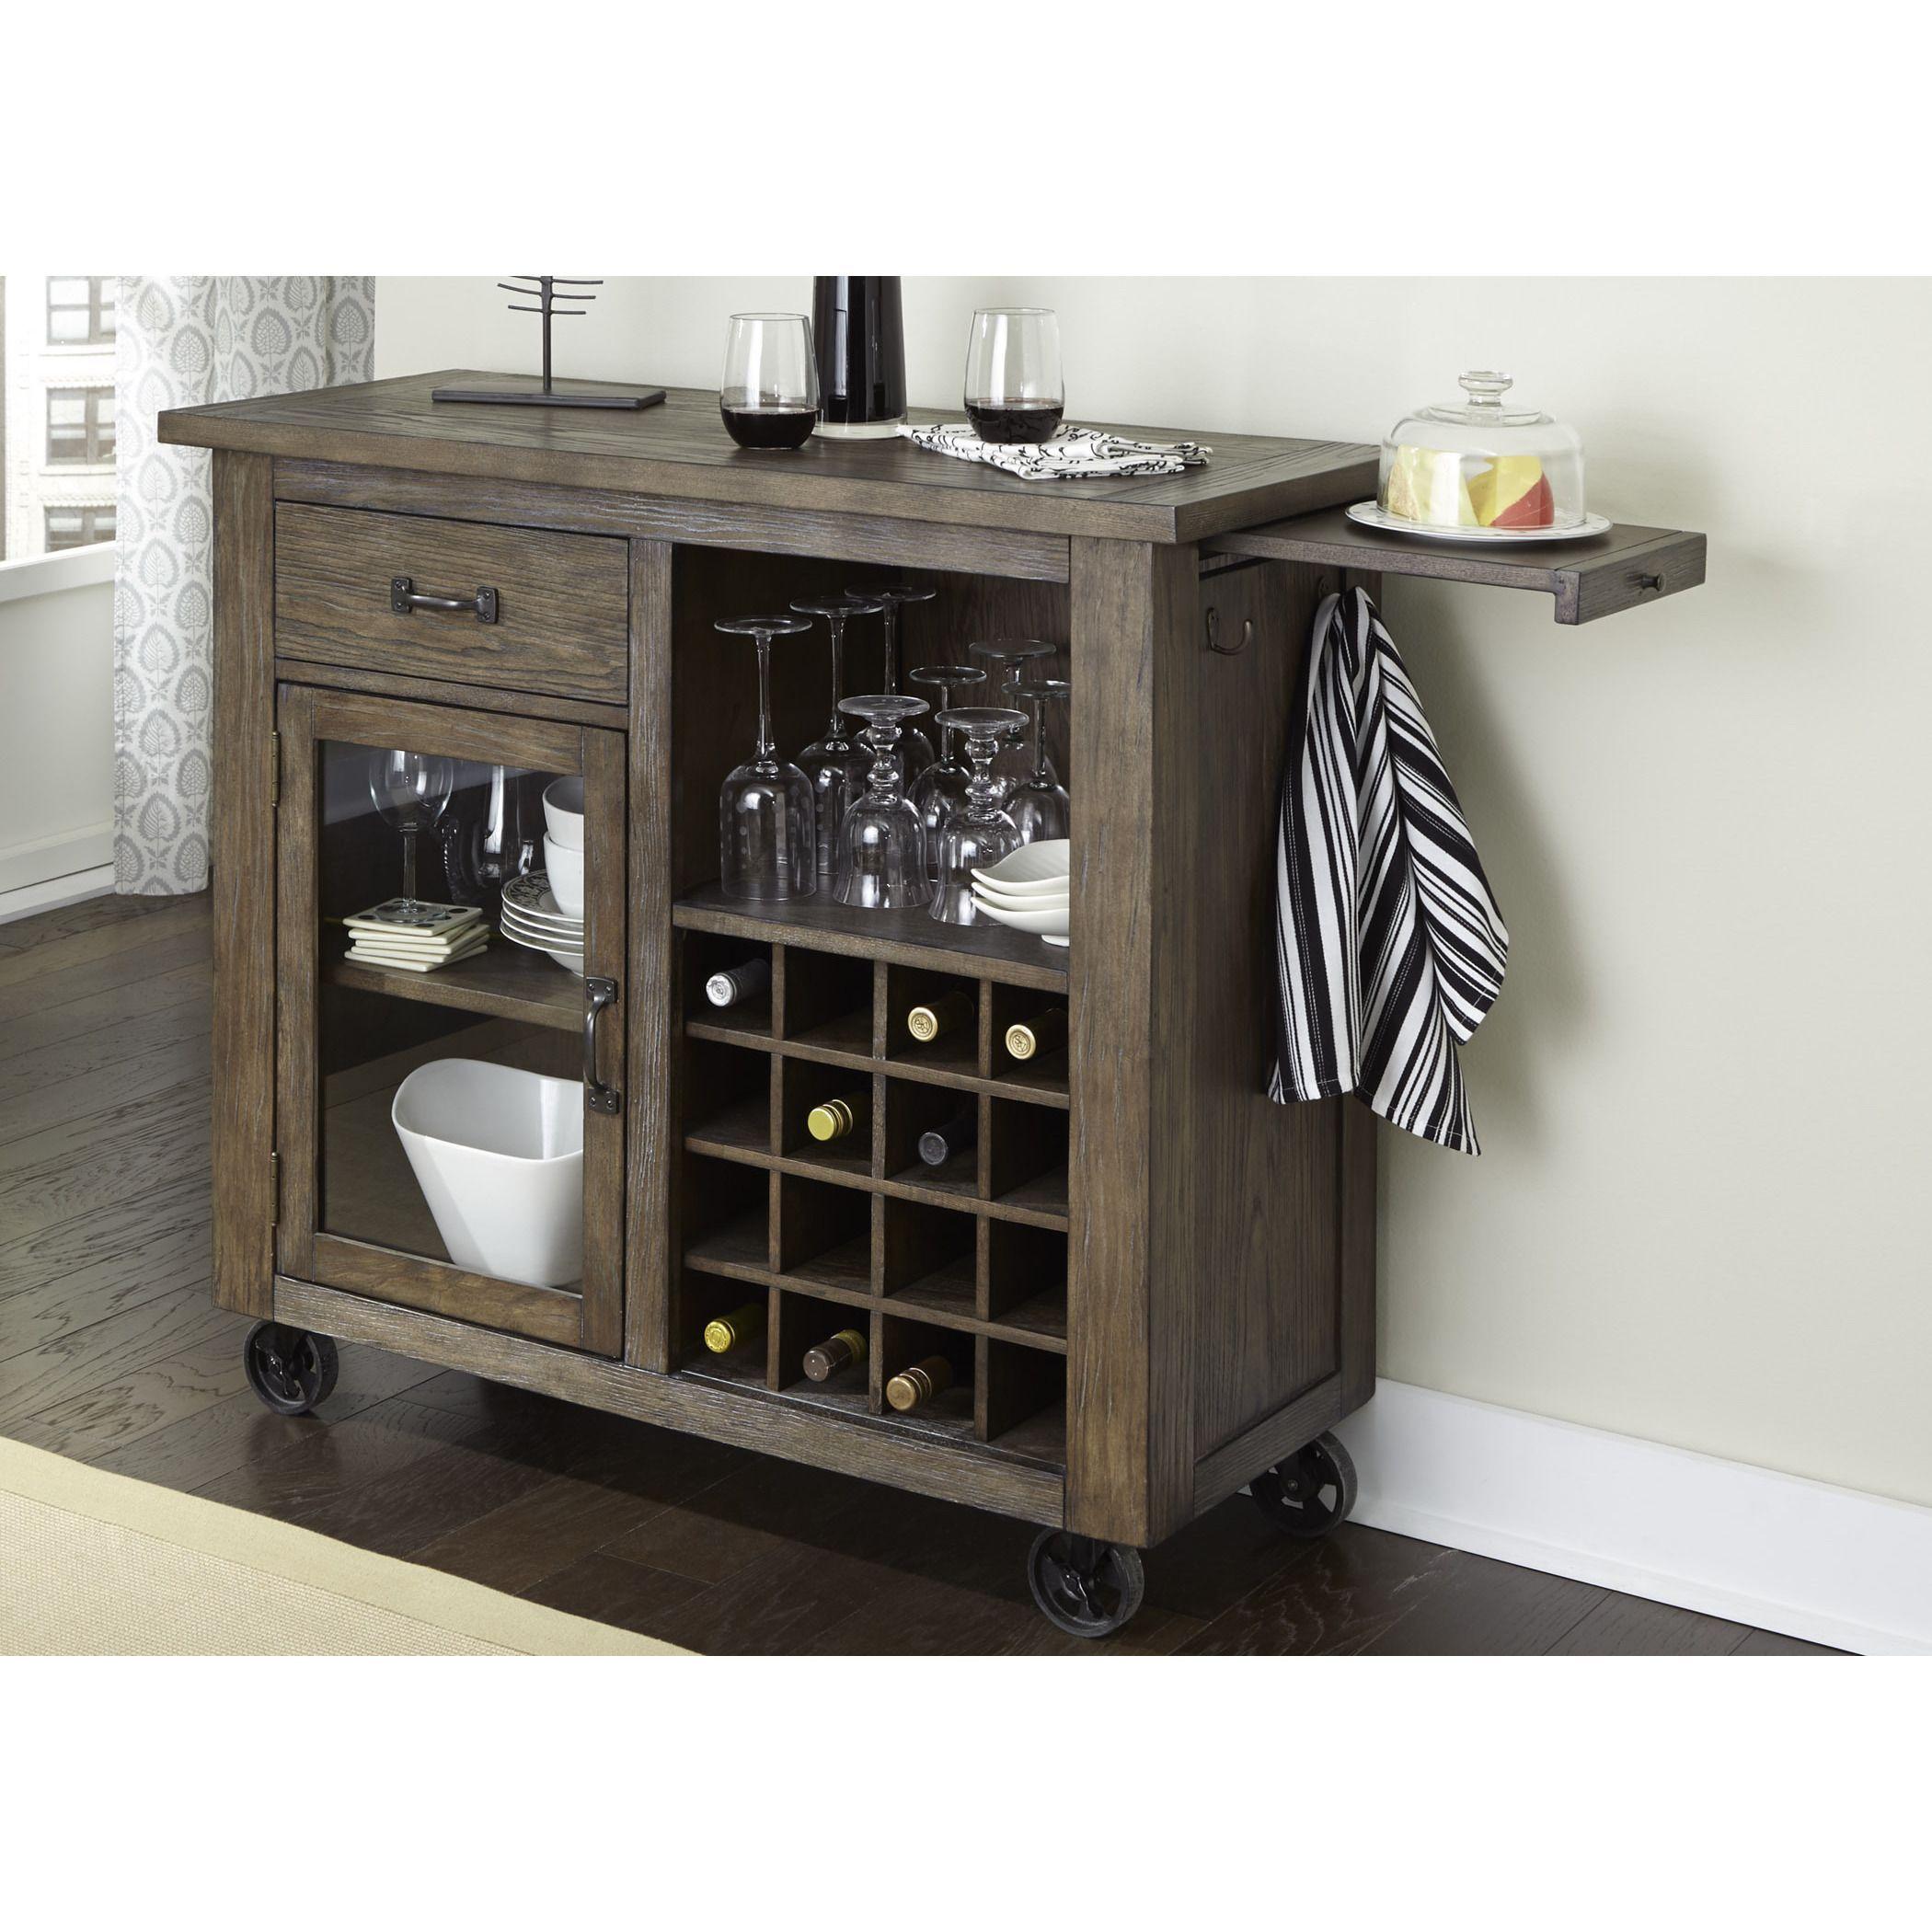 cart cabinet ip kitchen whalen rustic rack portable fe com walmart brown wine with santa